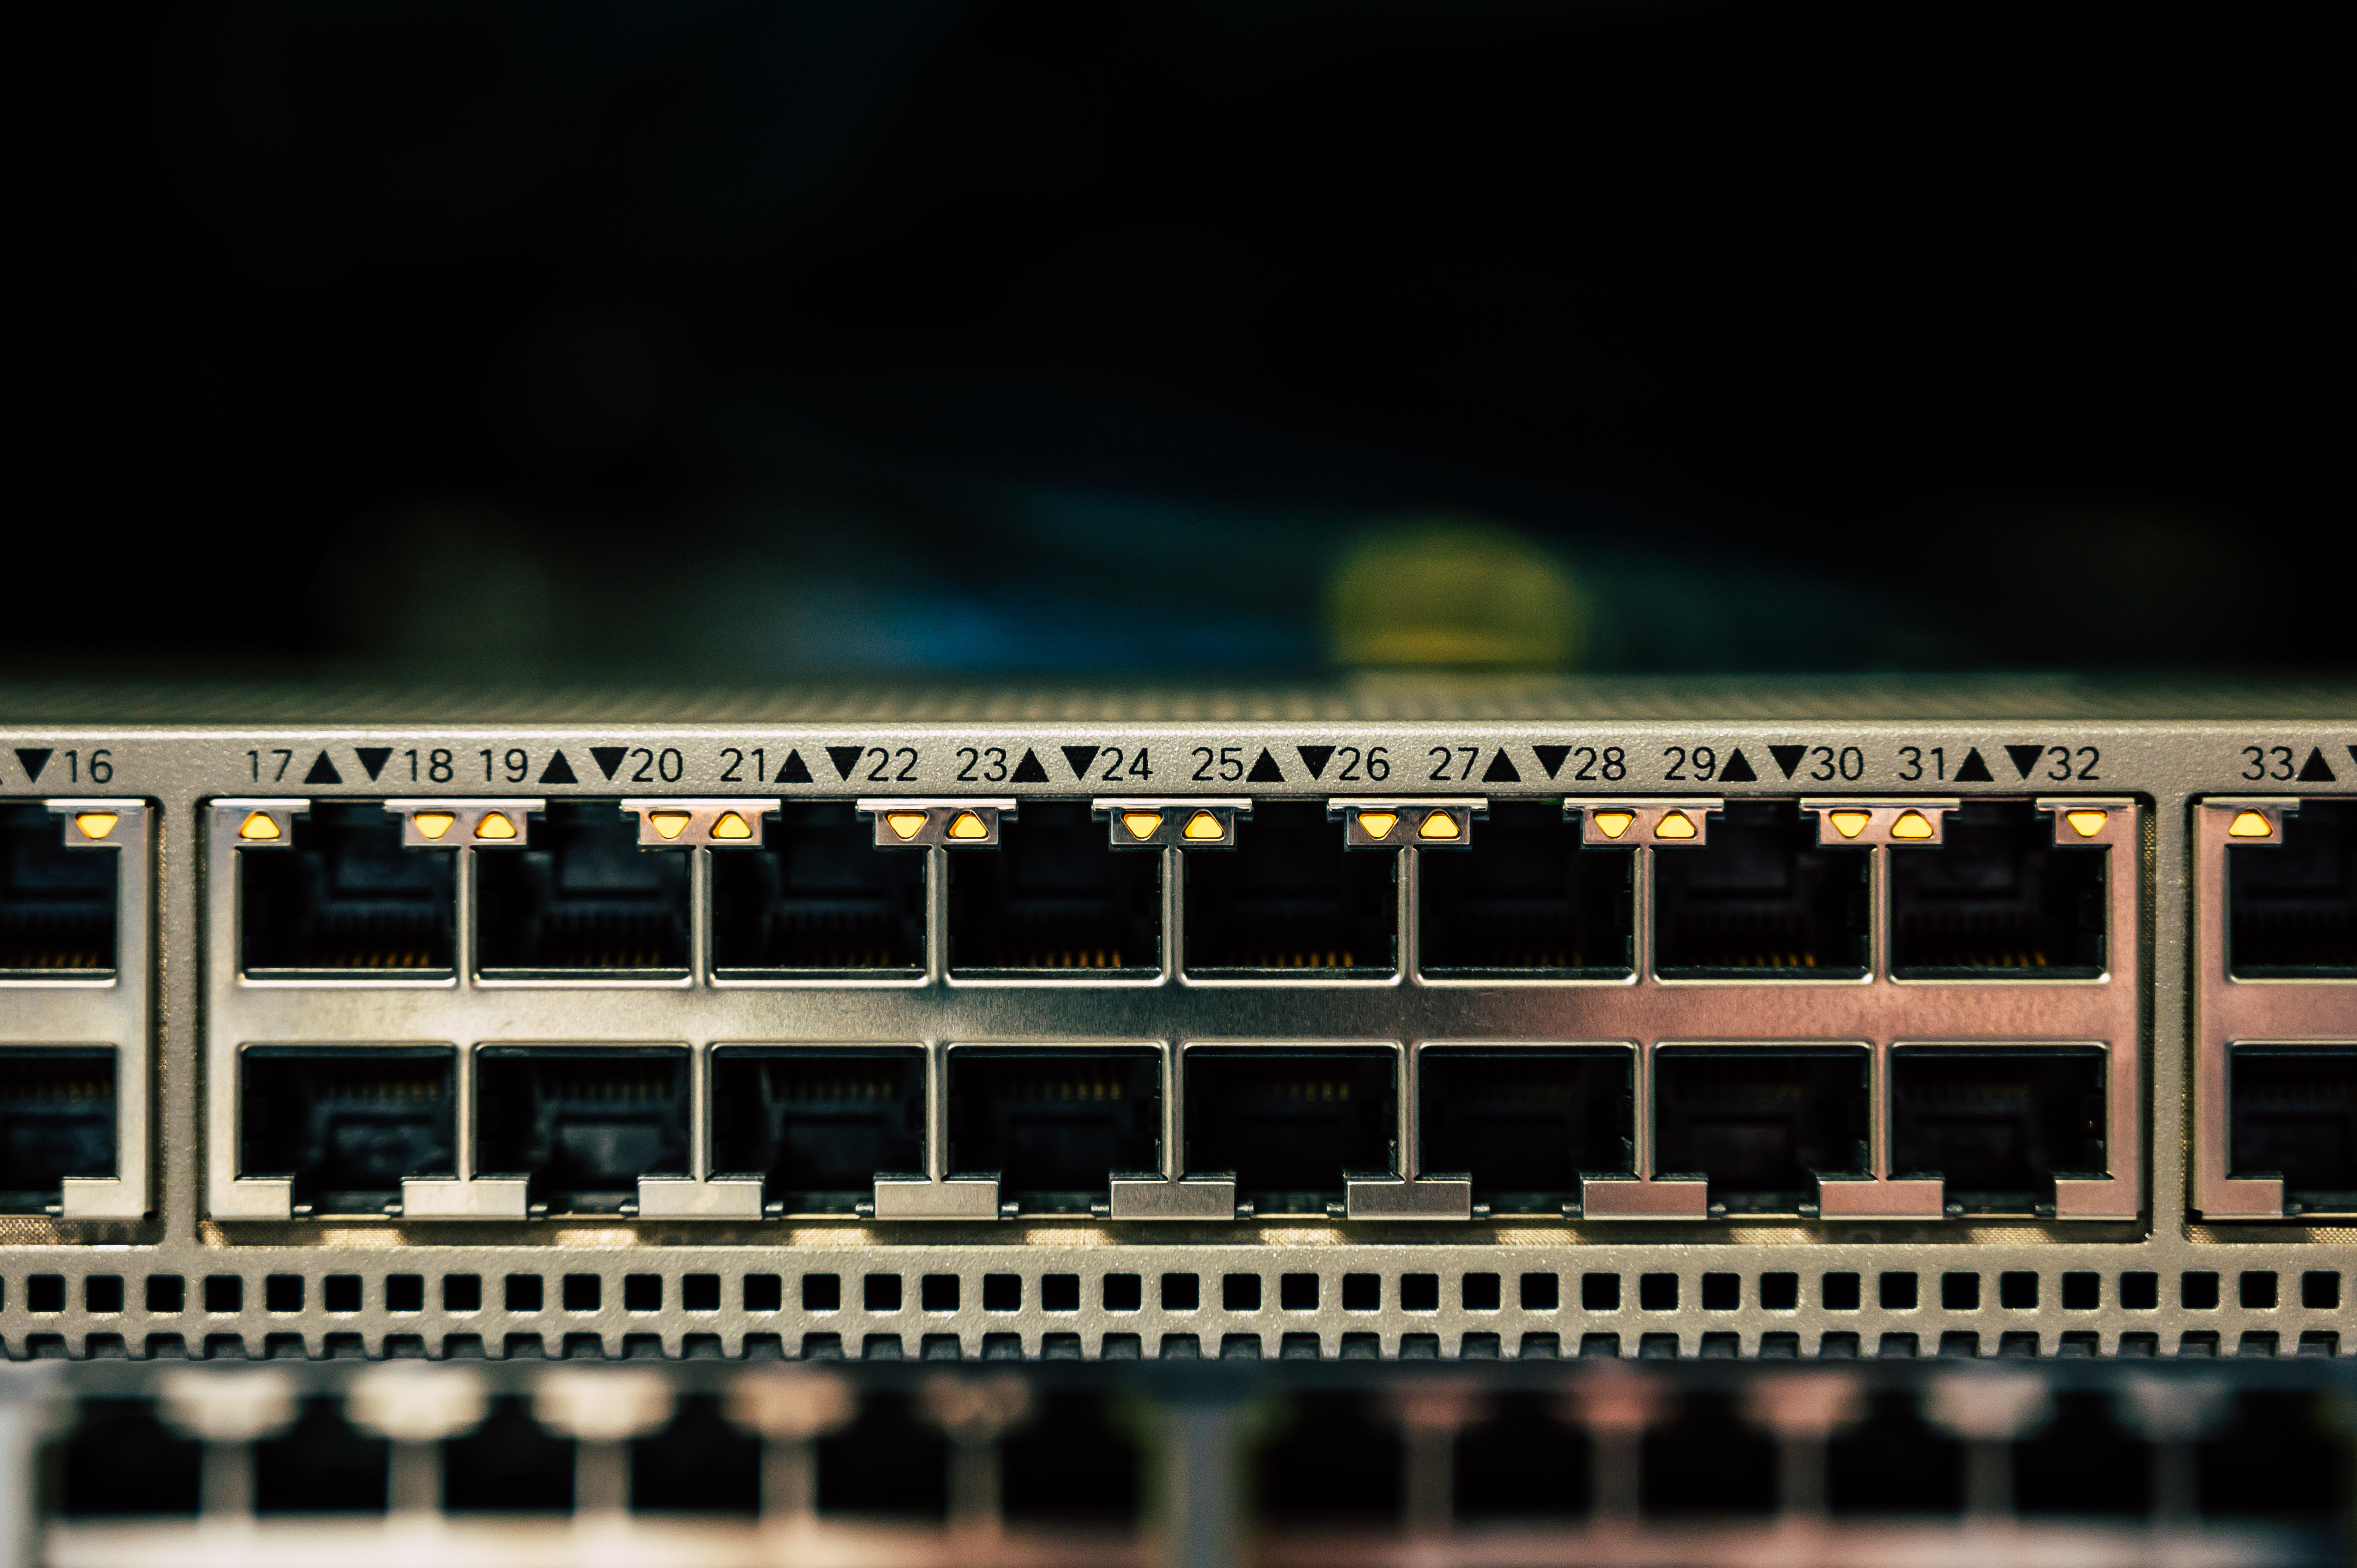 Close-up Photo of Computer Port